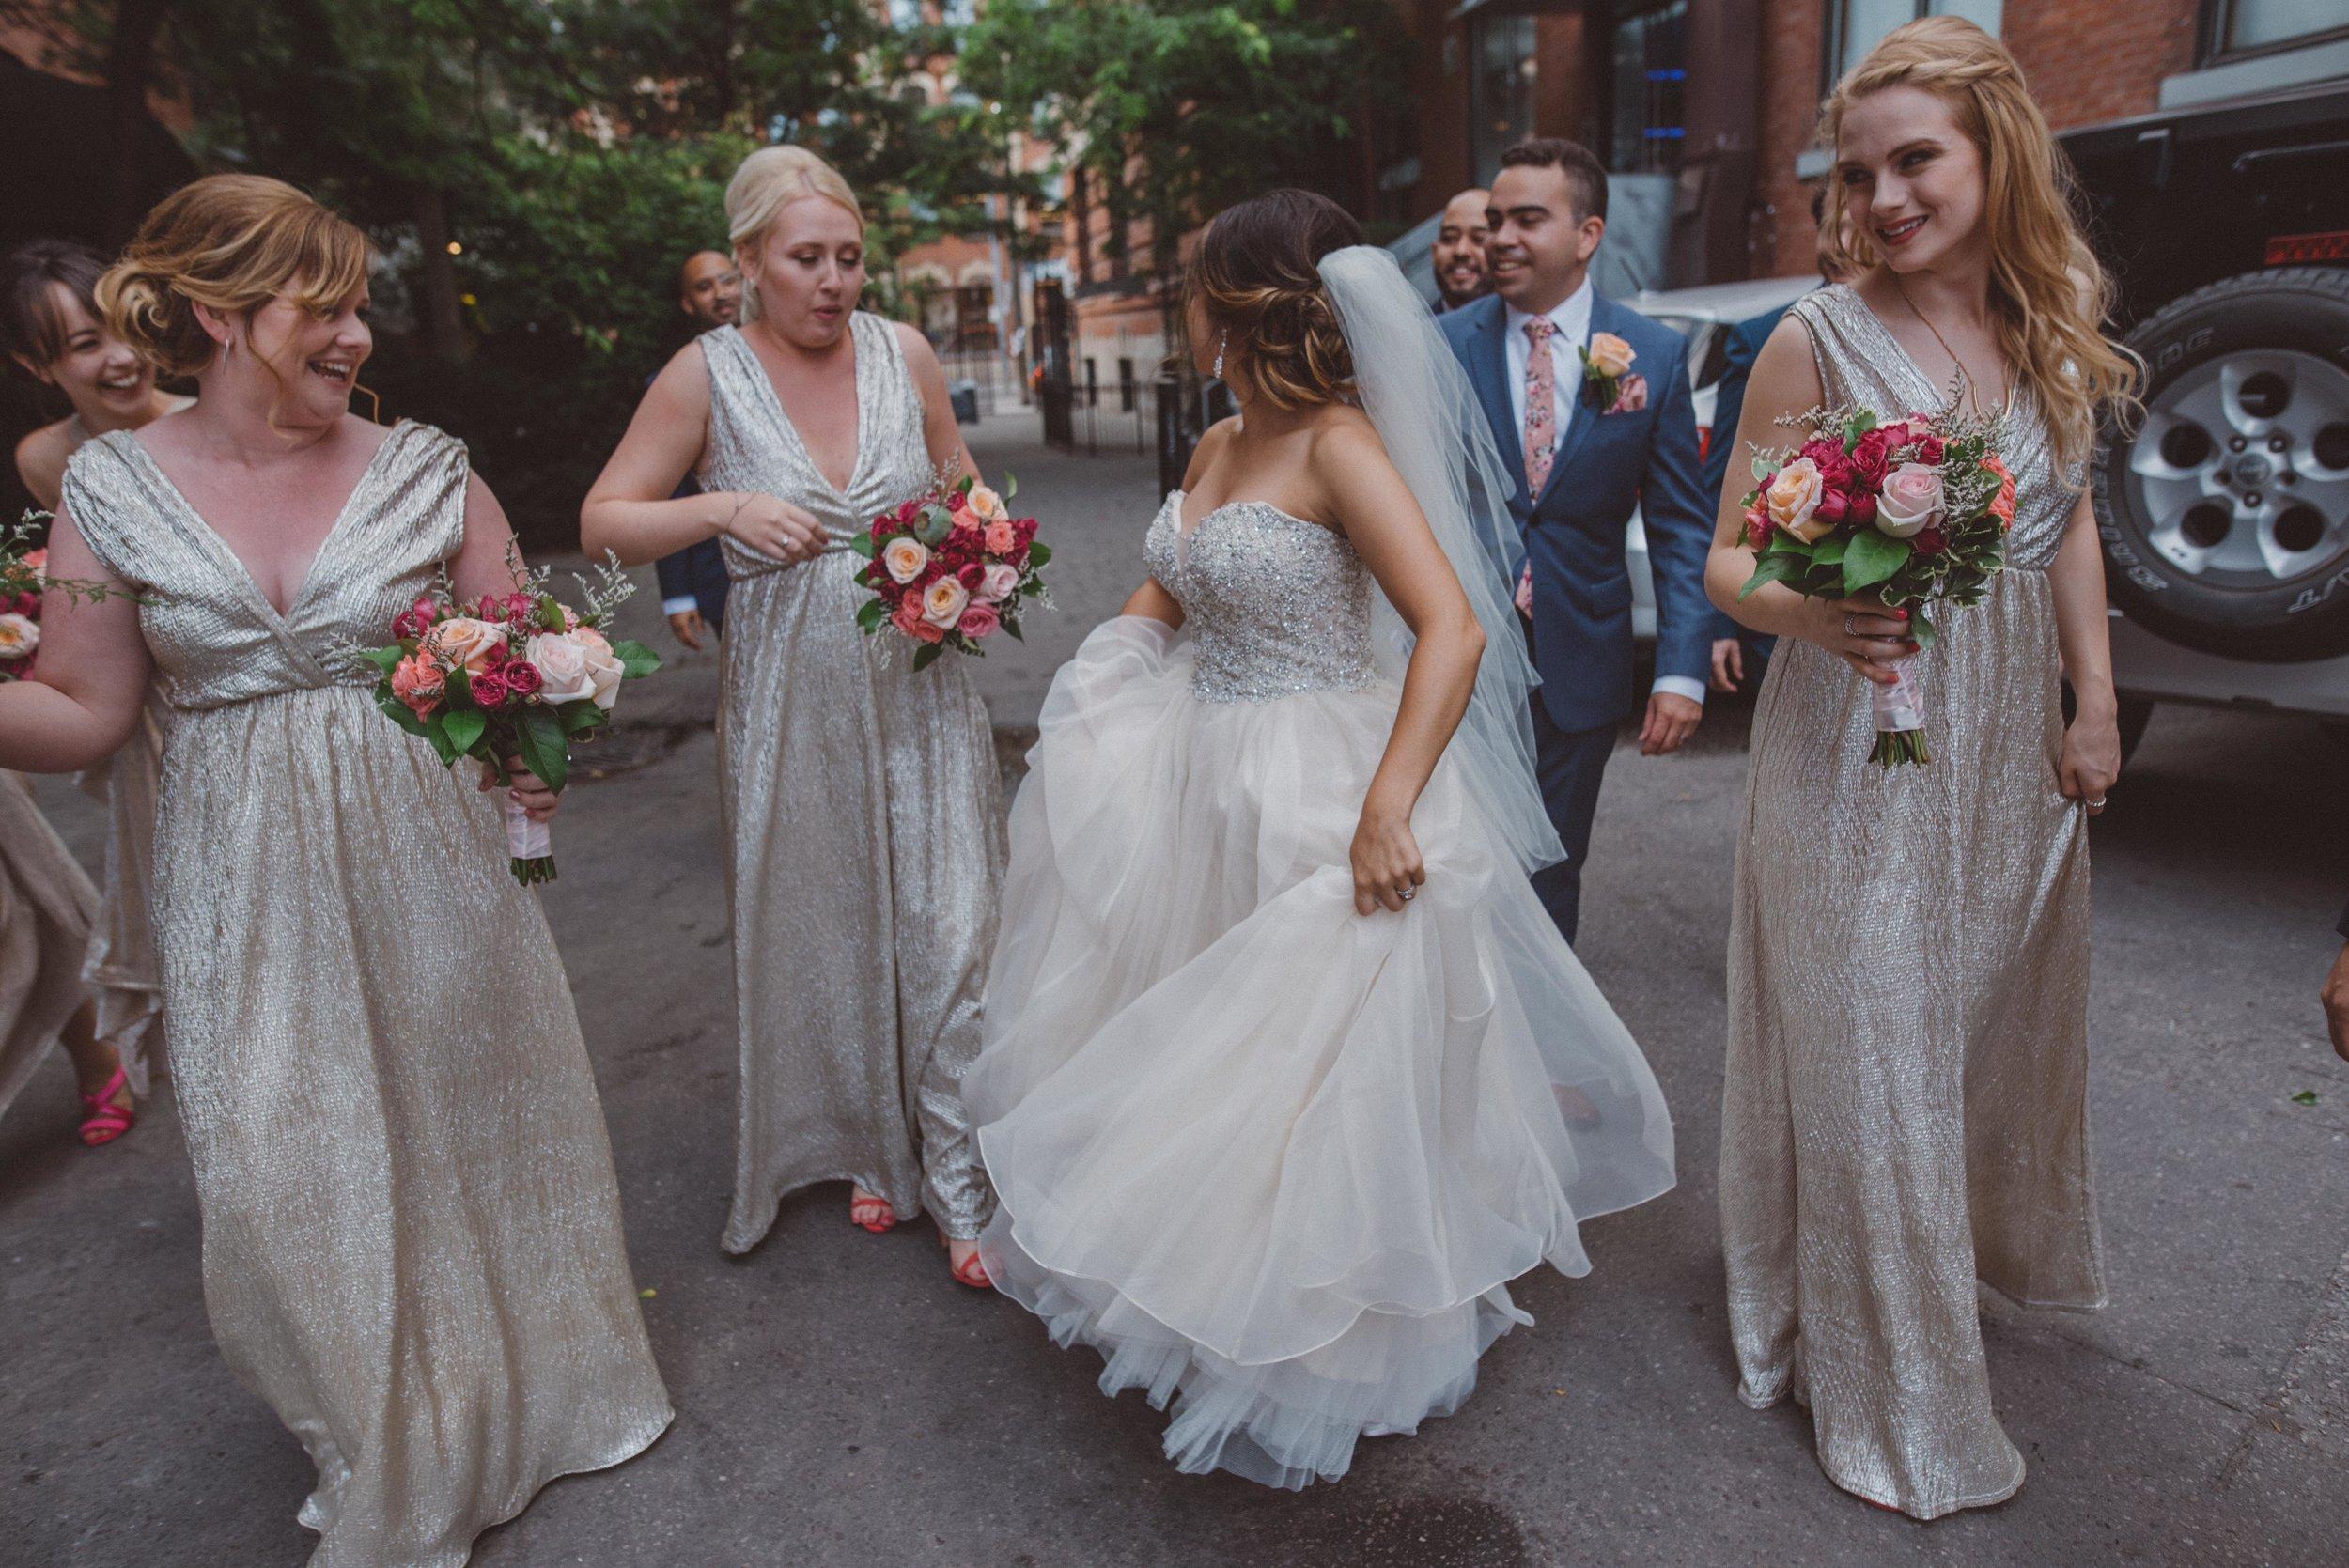 mariage_photographe_toronto_gatineau_ottawa_photographer_wedding-32.jpg